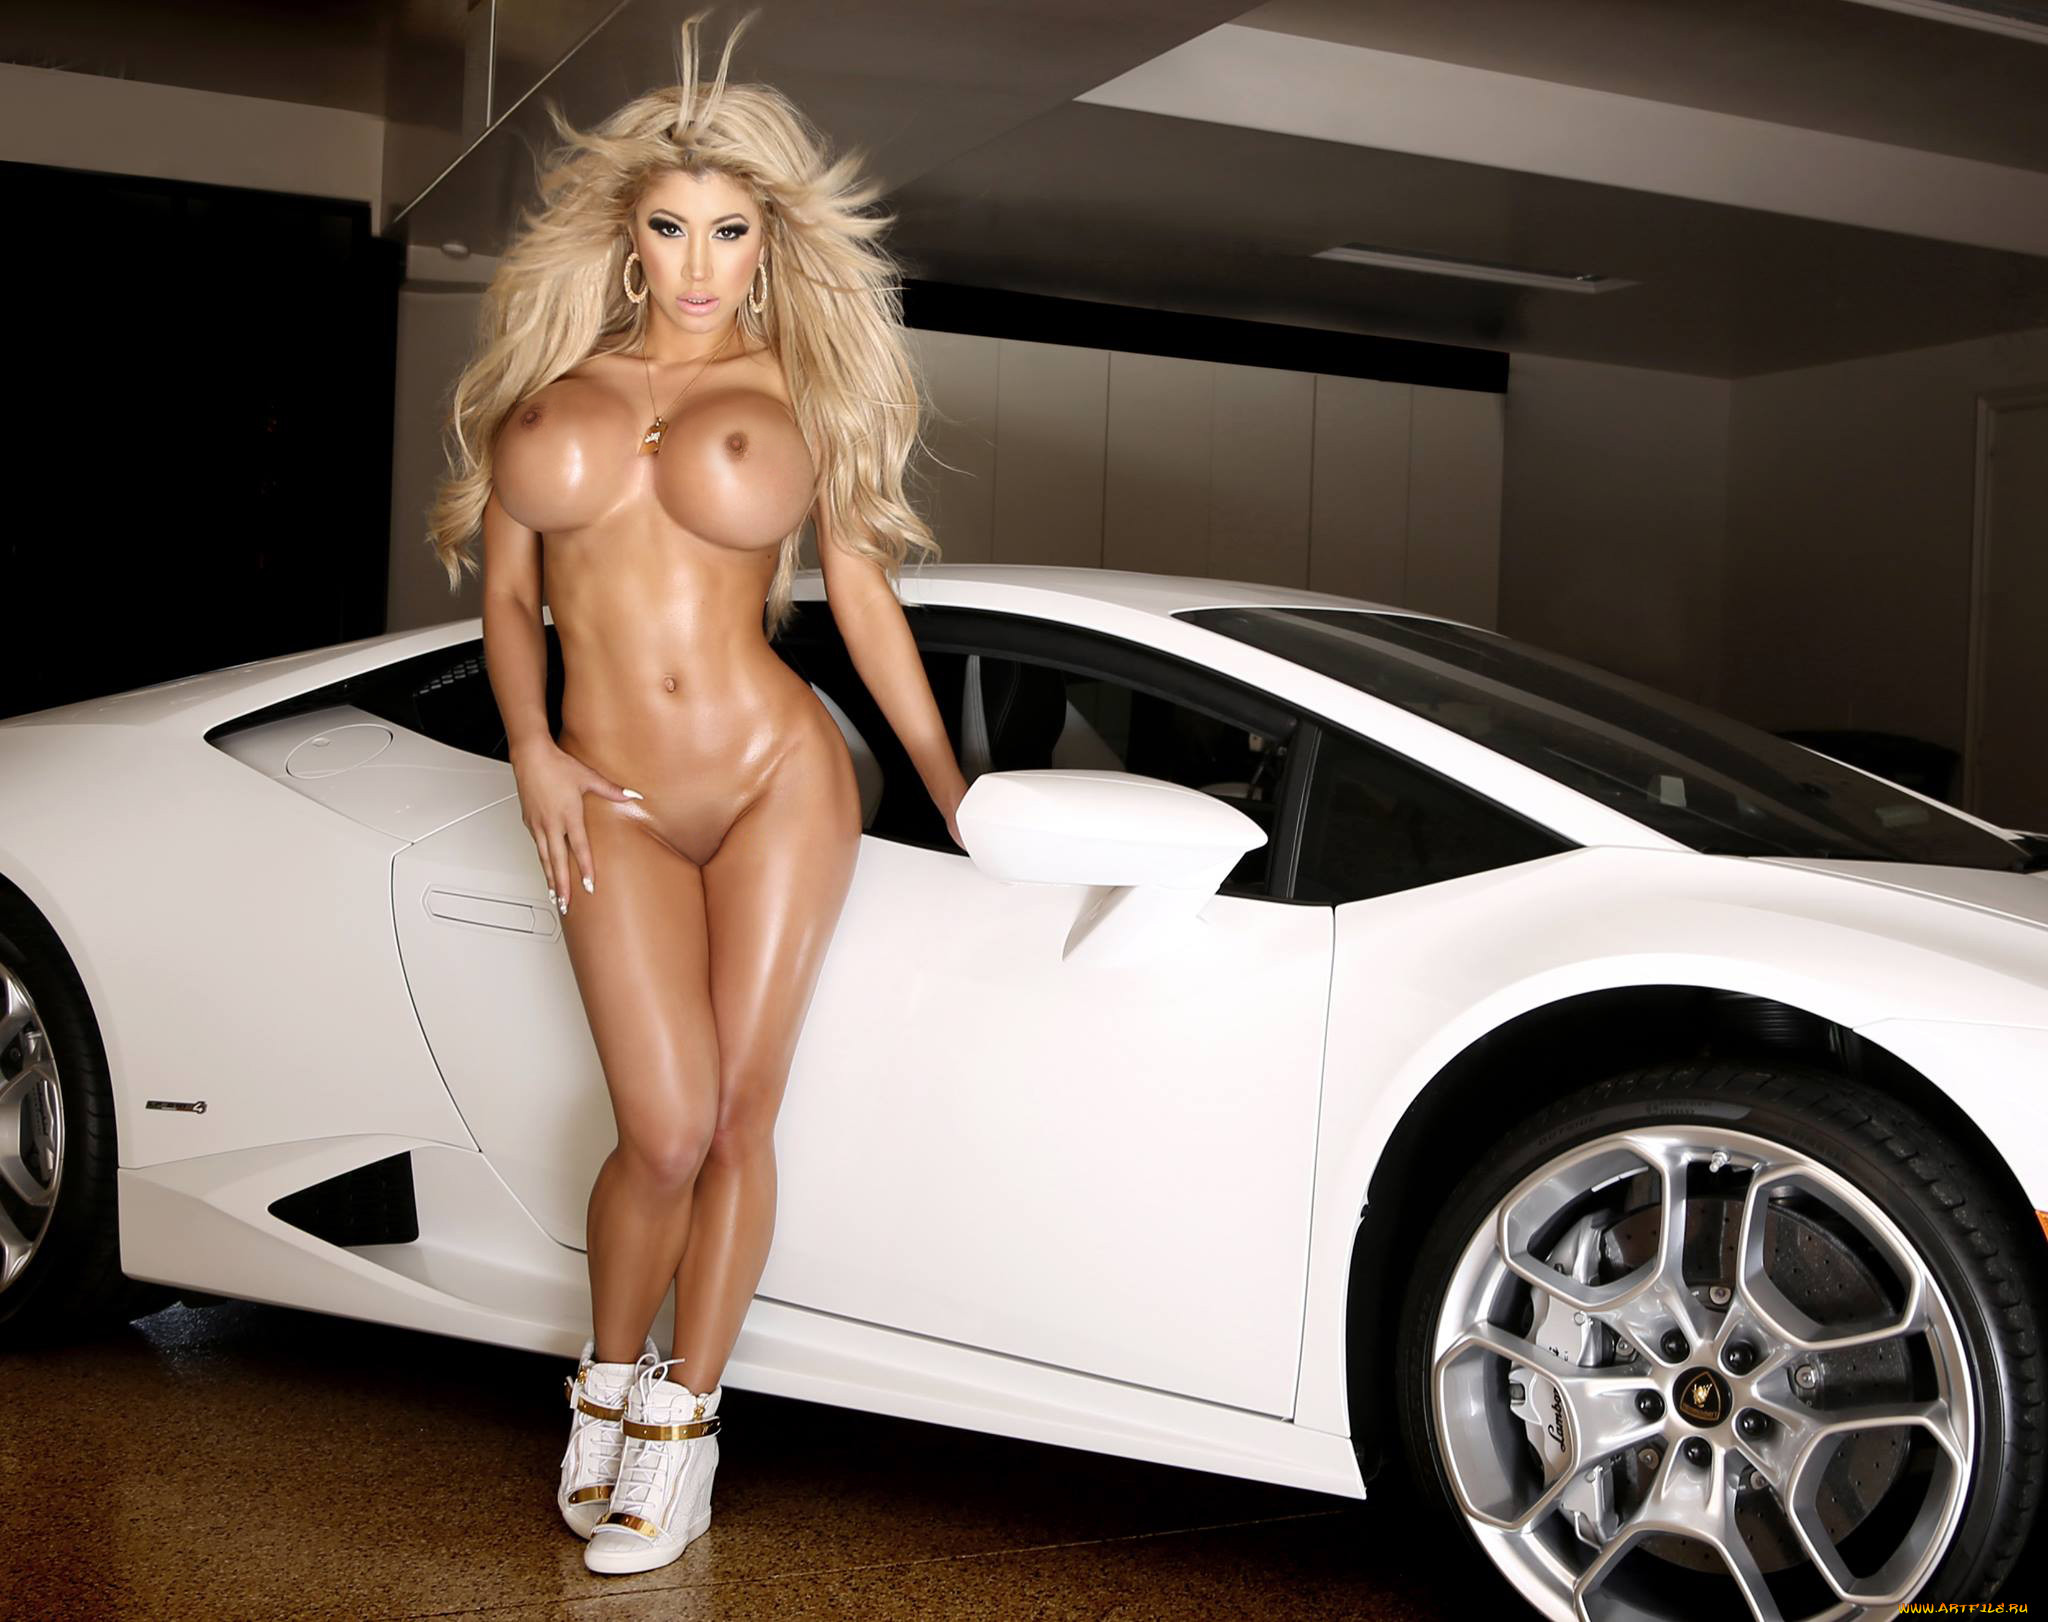 Авто и голые девушки